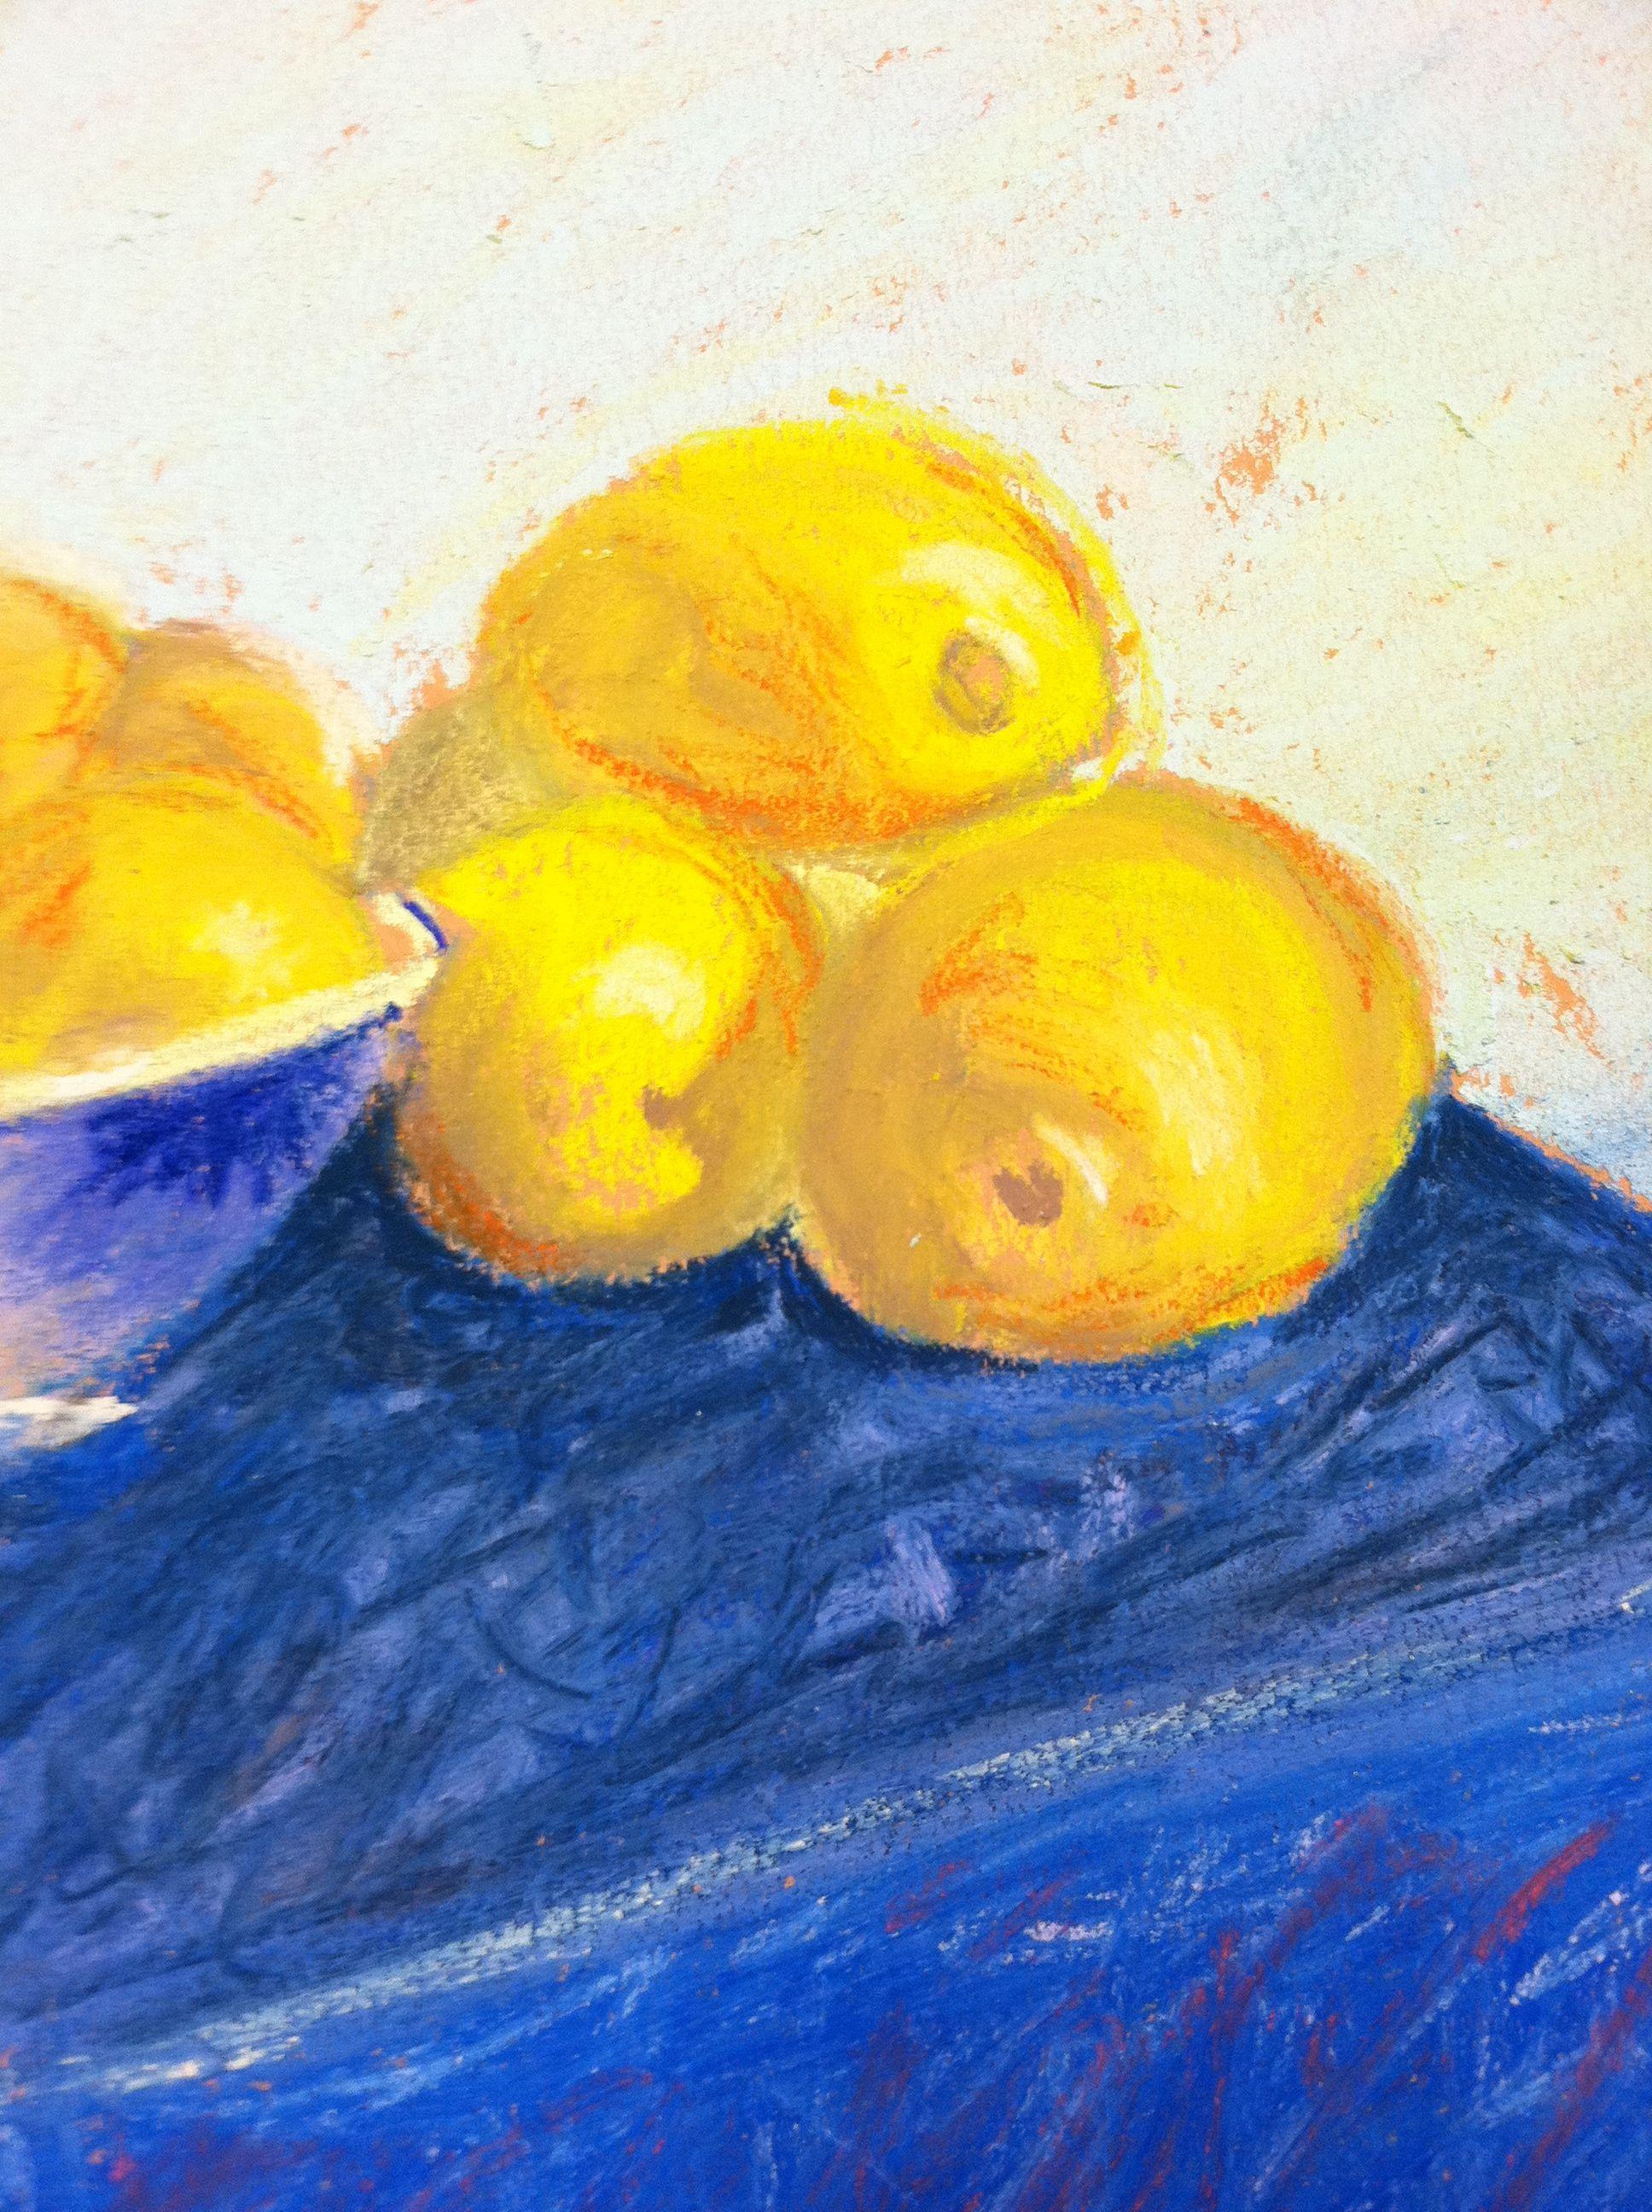 California lemons.